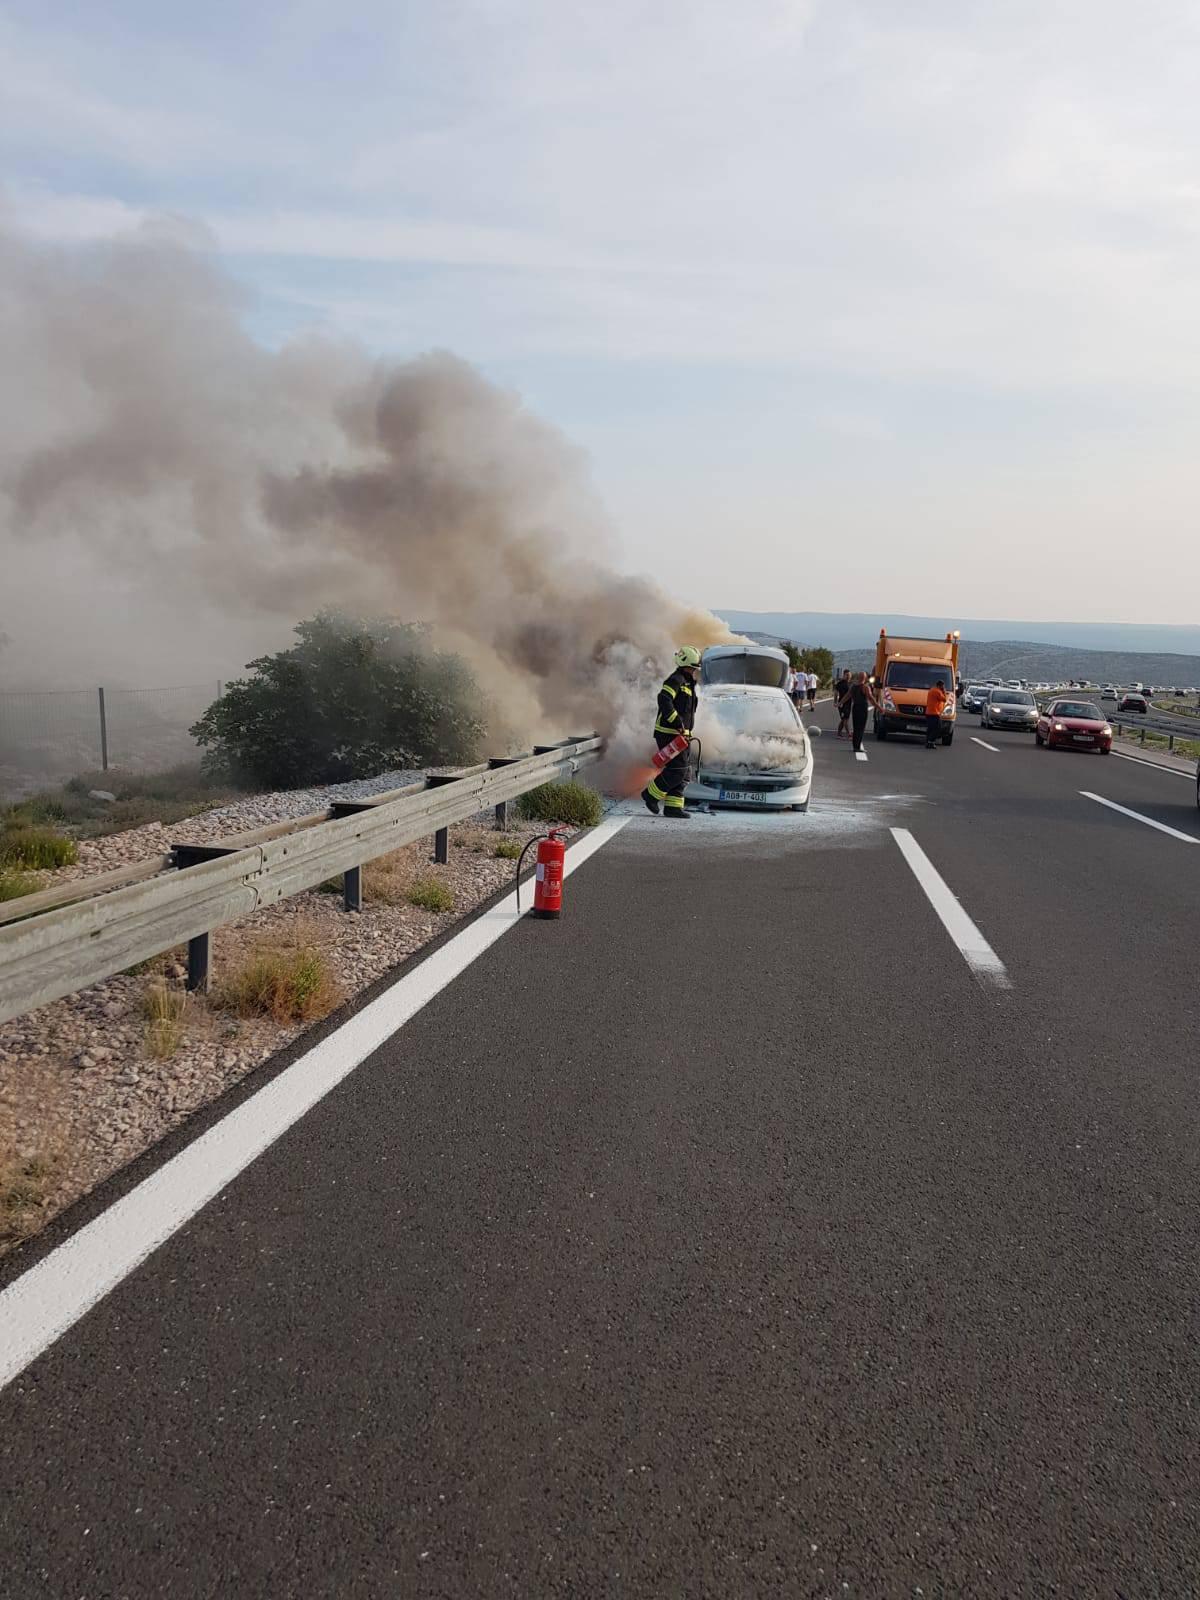 Gorio je automobil kraj tunela Sv. Rok: 'Obitelj je preplašena'